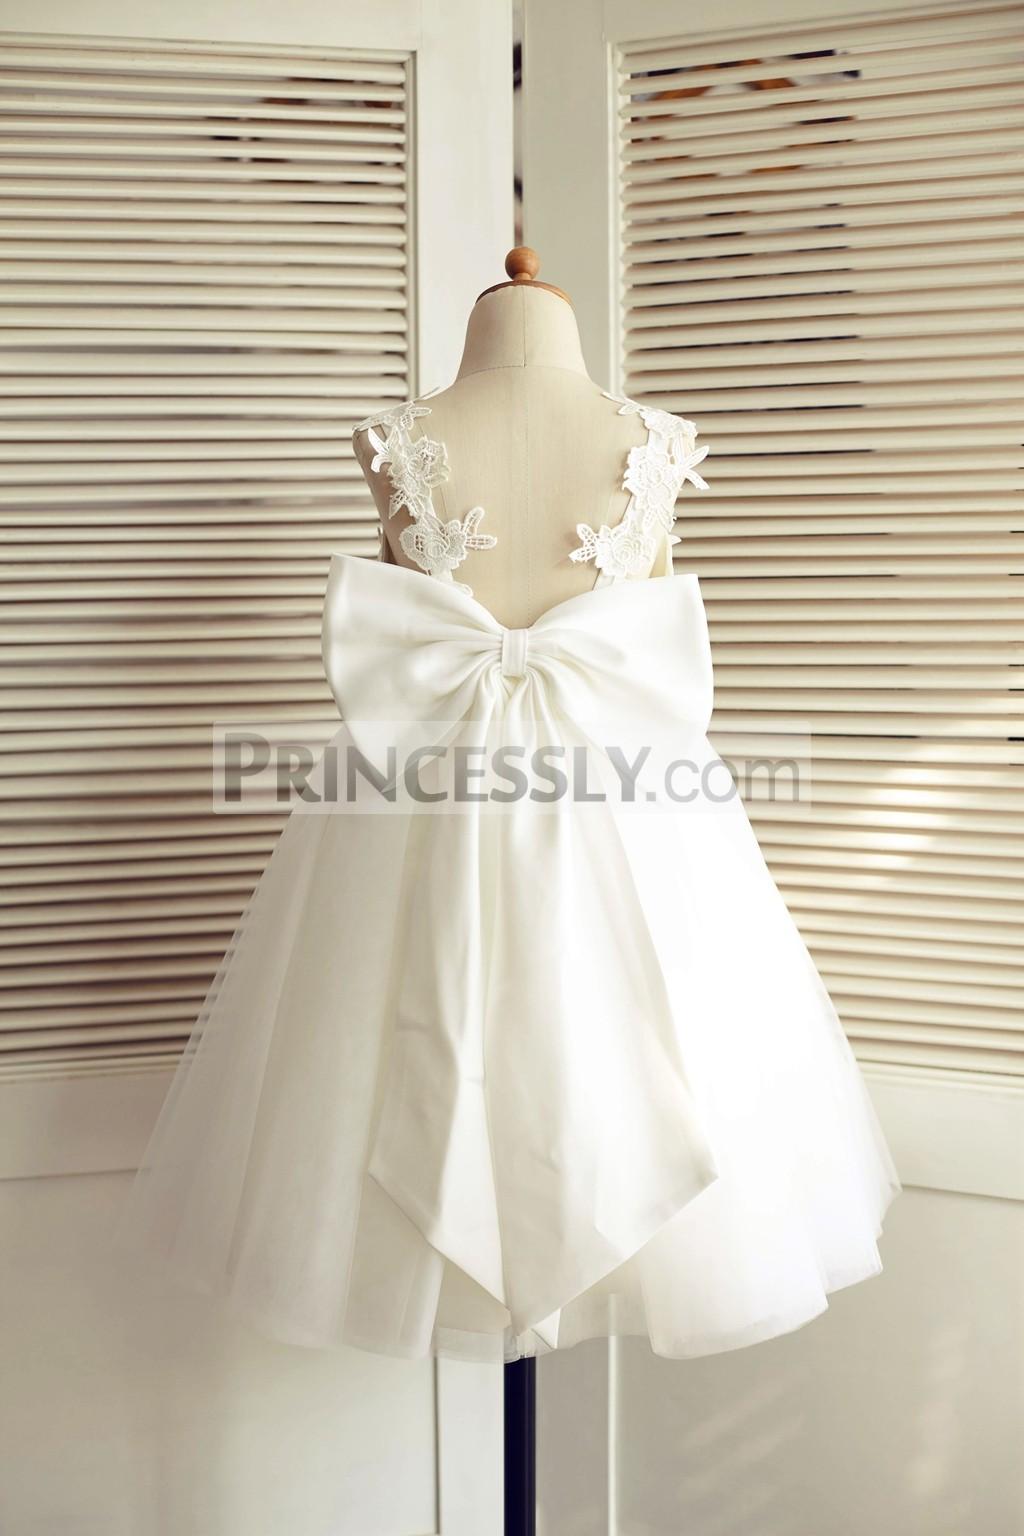 Princessly.com-K1003509-Ivory Lace Tulle V Back Wedding Flower Girl Dress with Big Bow-31